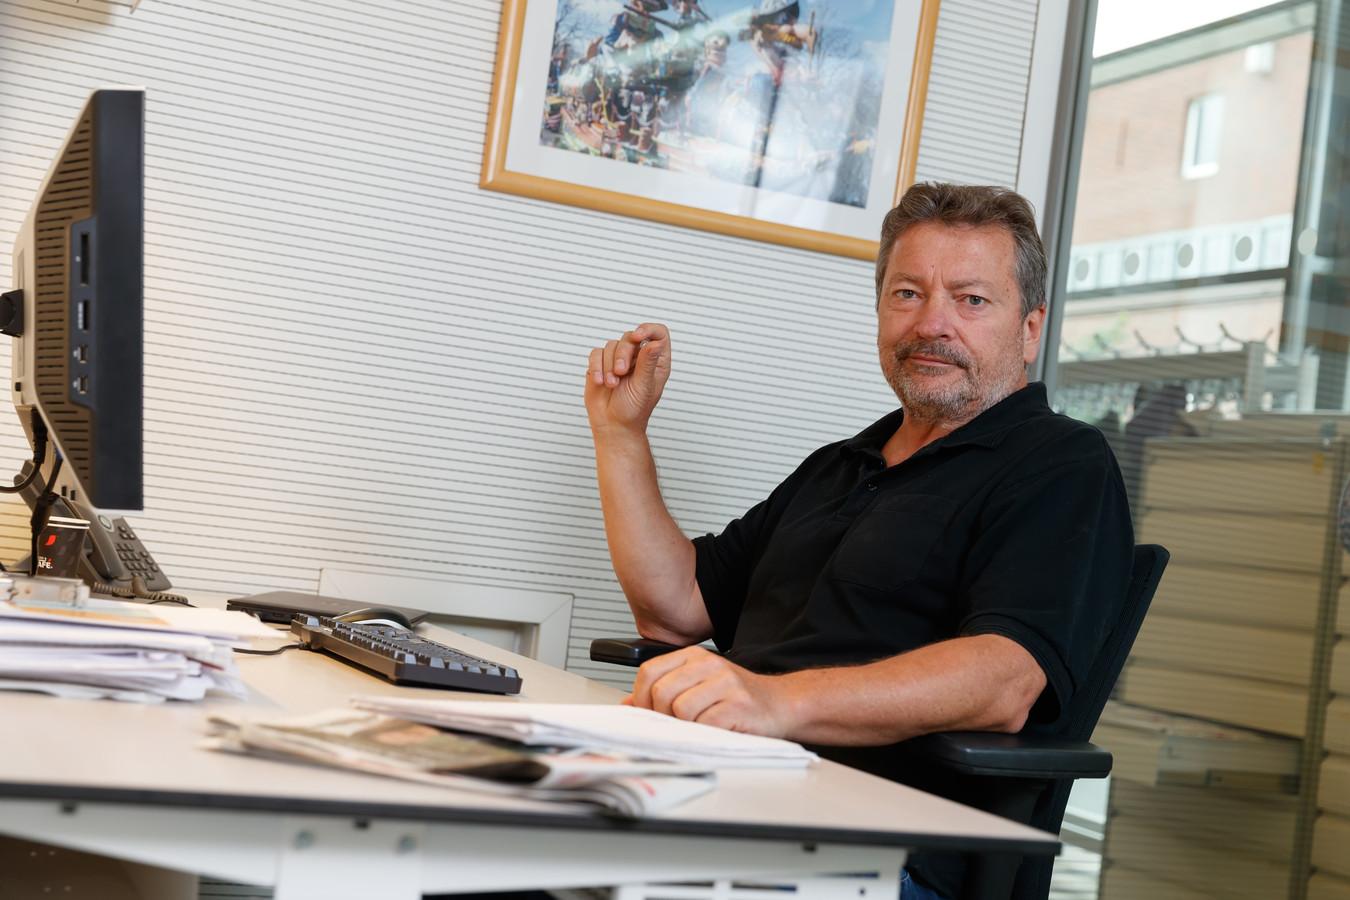 Verslaggever Hessel de Ree